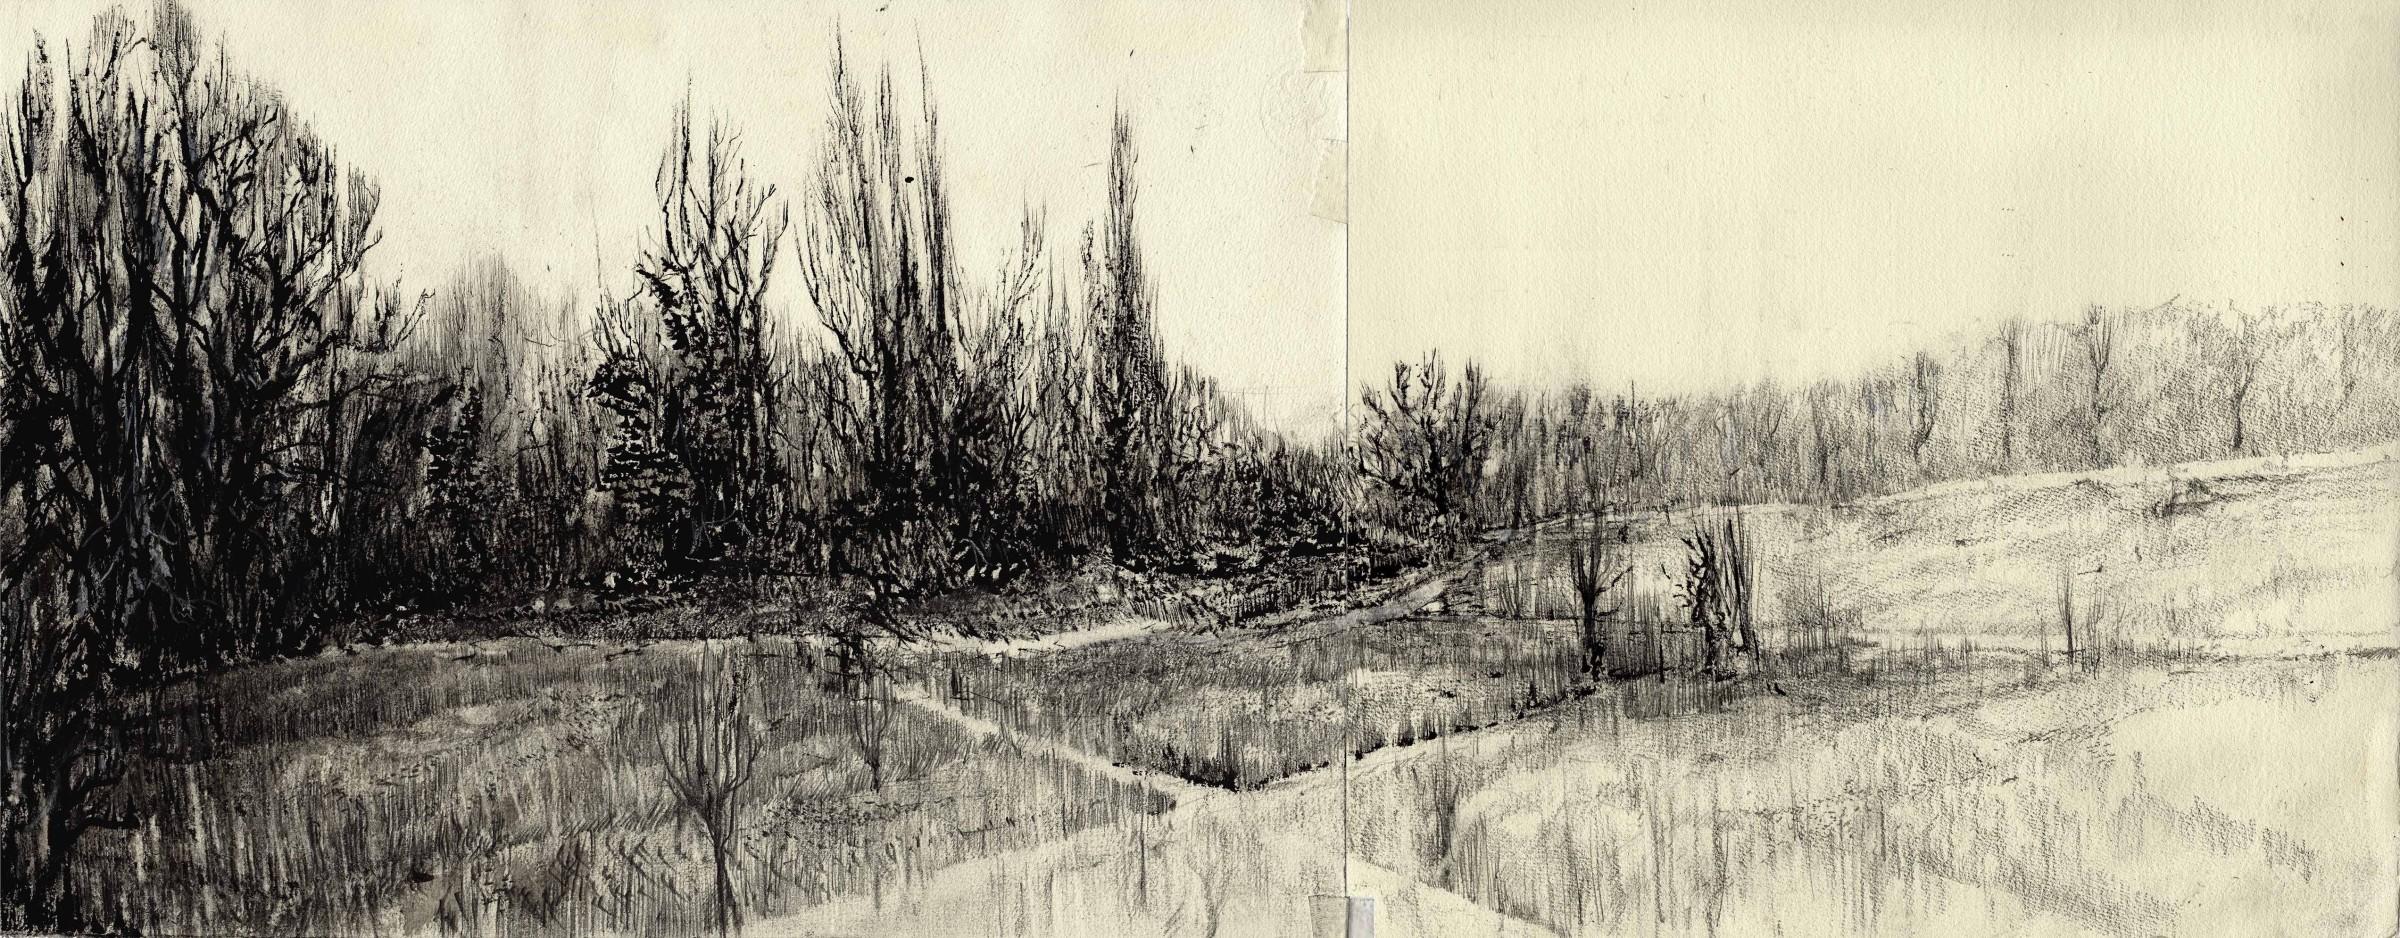 <span class=&#34;link fancybox-details-link&#34;><a href=&#34;/exhibitions/16/works/image_standalone363/&#34;>View Detail Page</a></span><p>Joshua Bristow,&#160;<em>Cohens Fields, Hampstead Heath,&#160;</em>&#163;750</p>